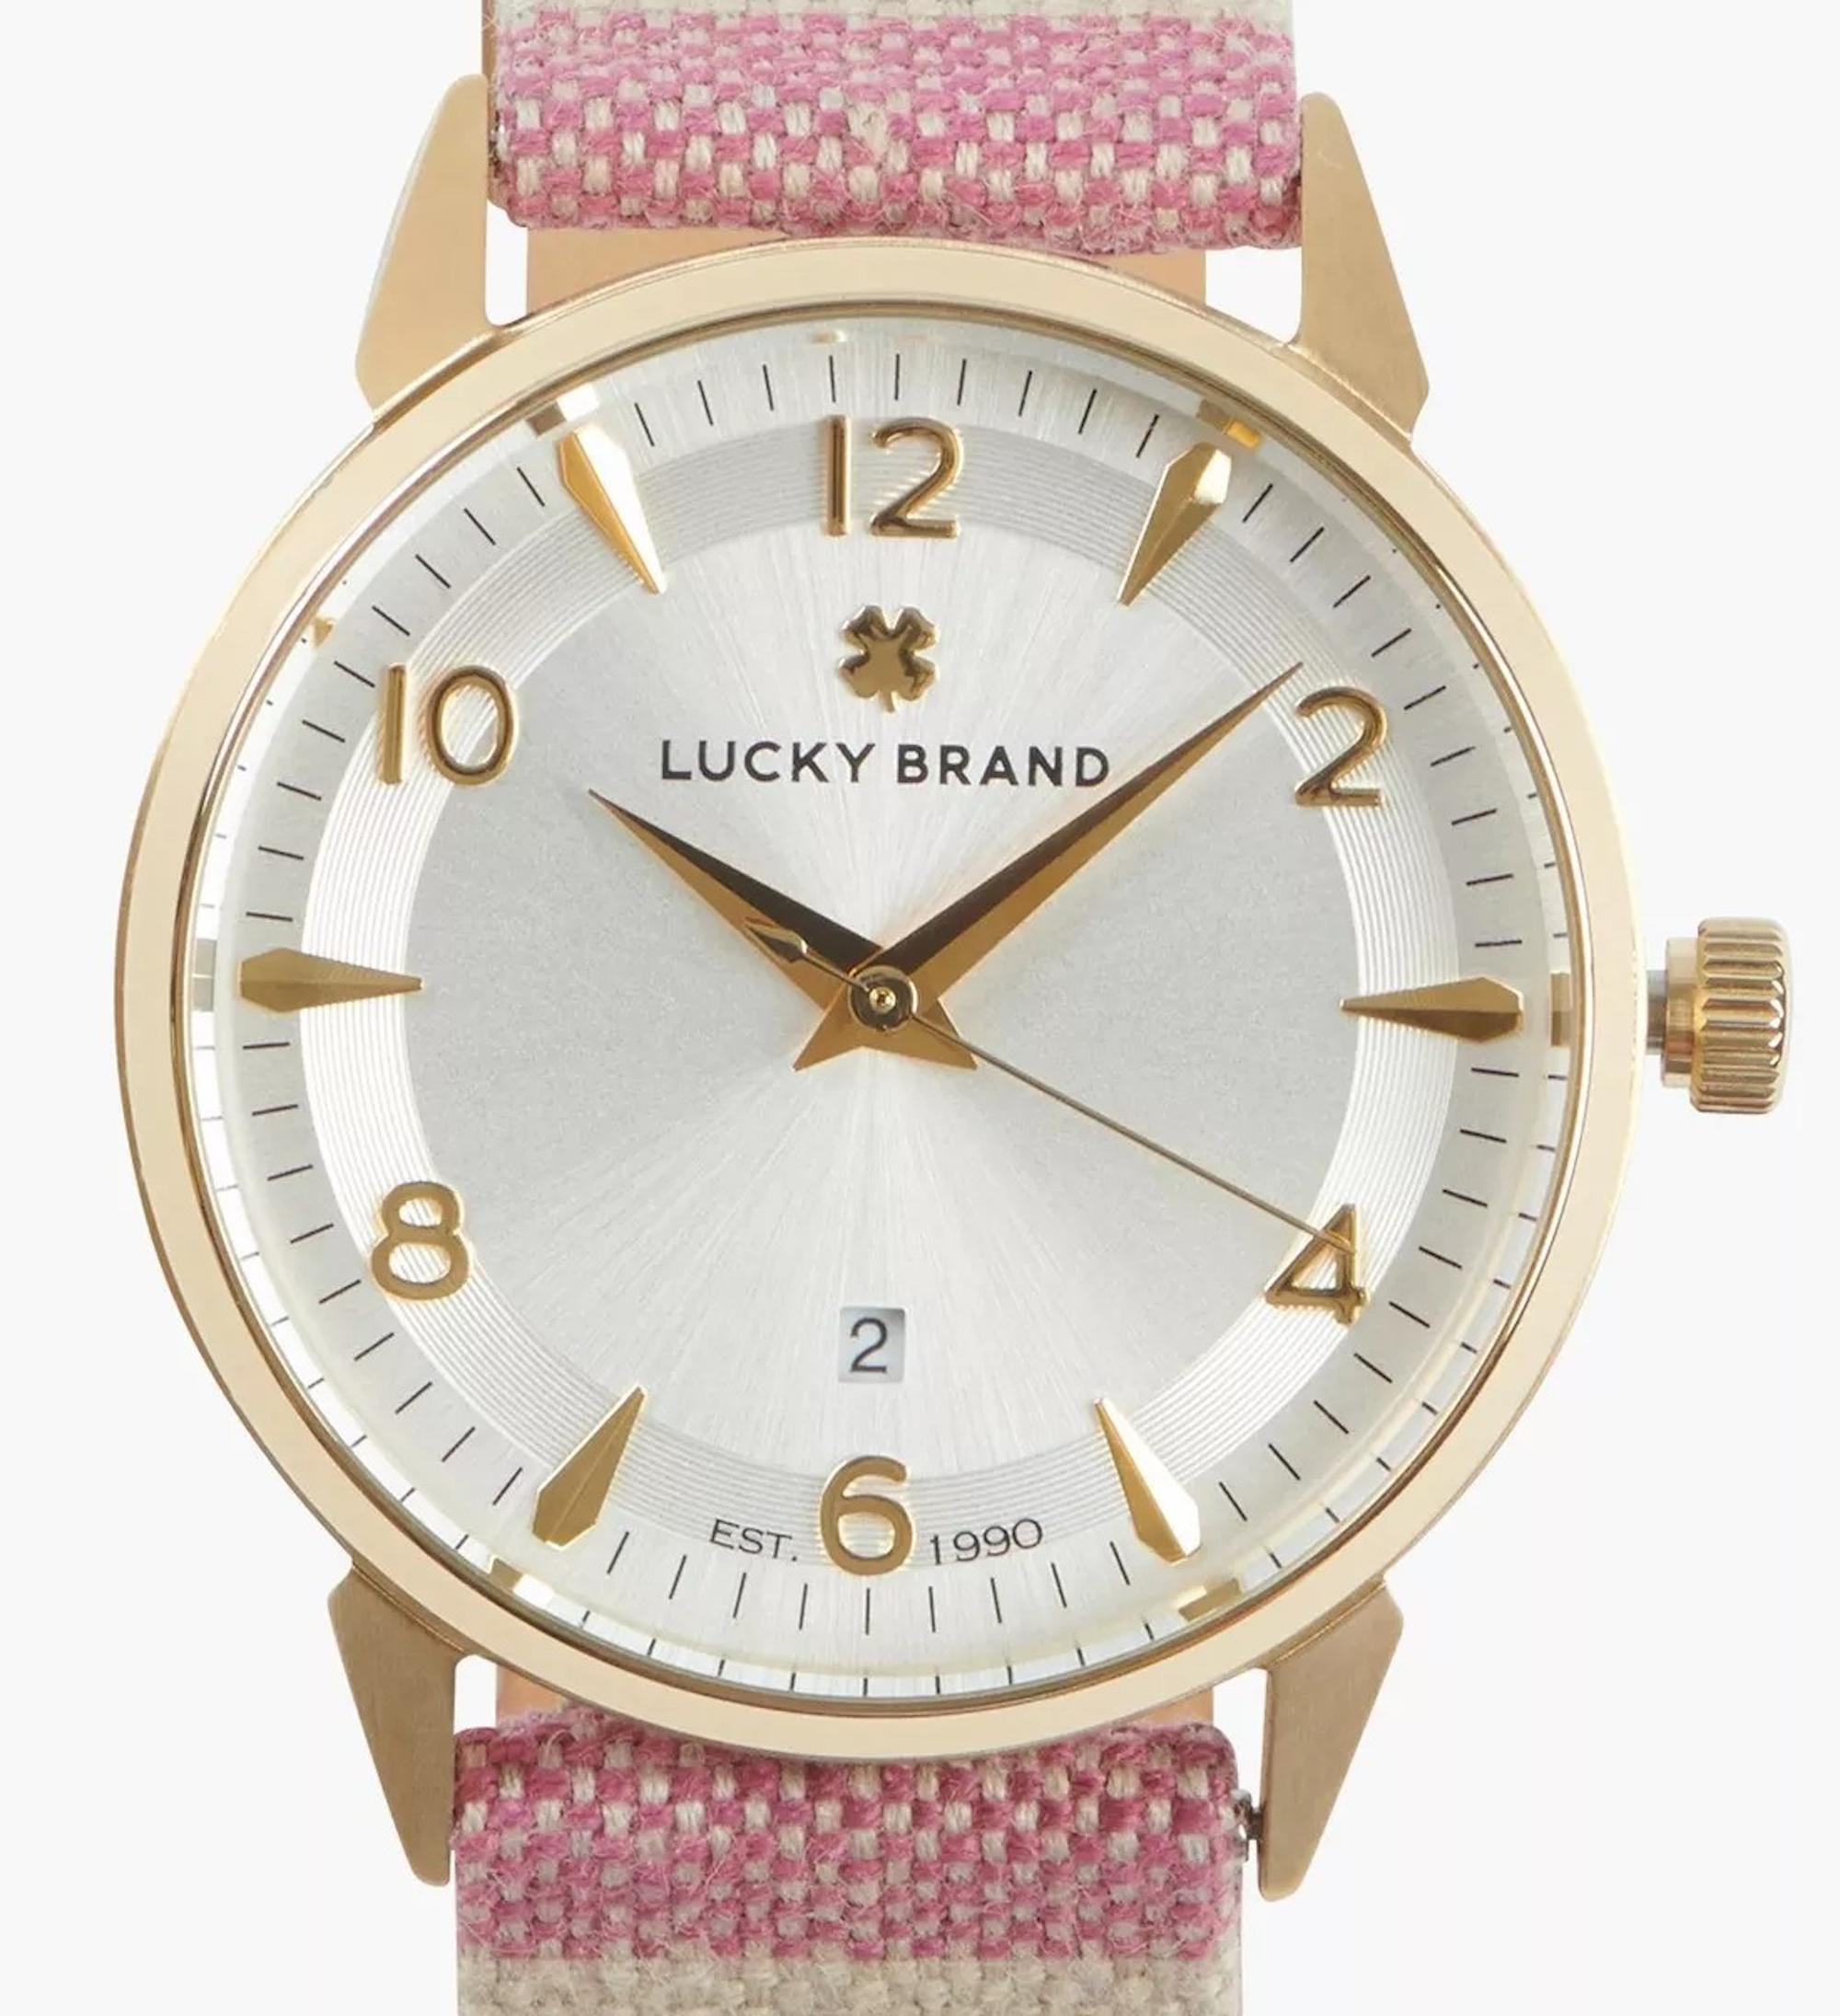 Lucky Brand: Women's Torrey Serape Stripe Watch $18 + Free S/H